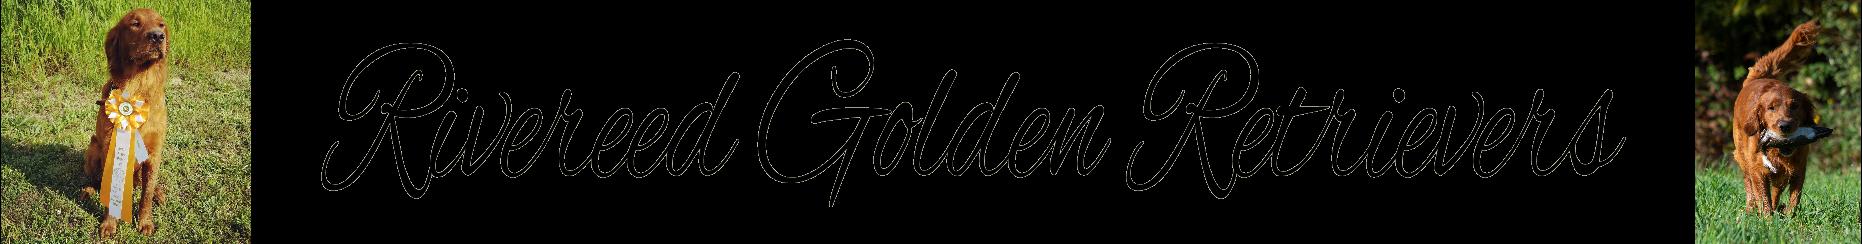 Rivereed Goldens